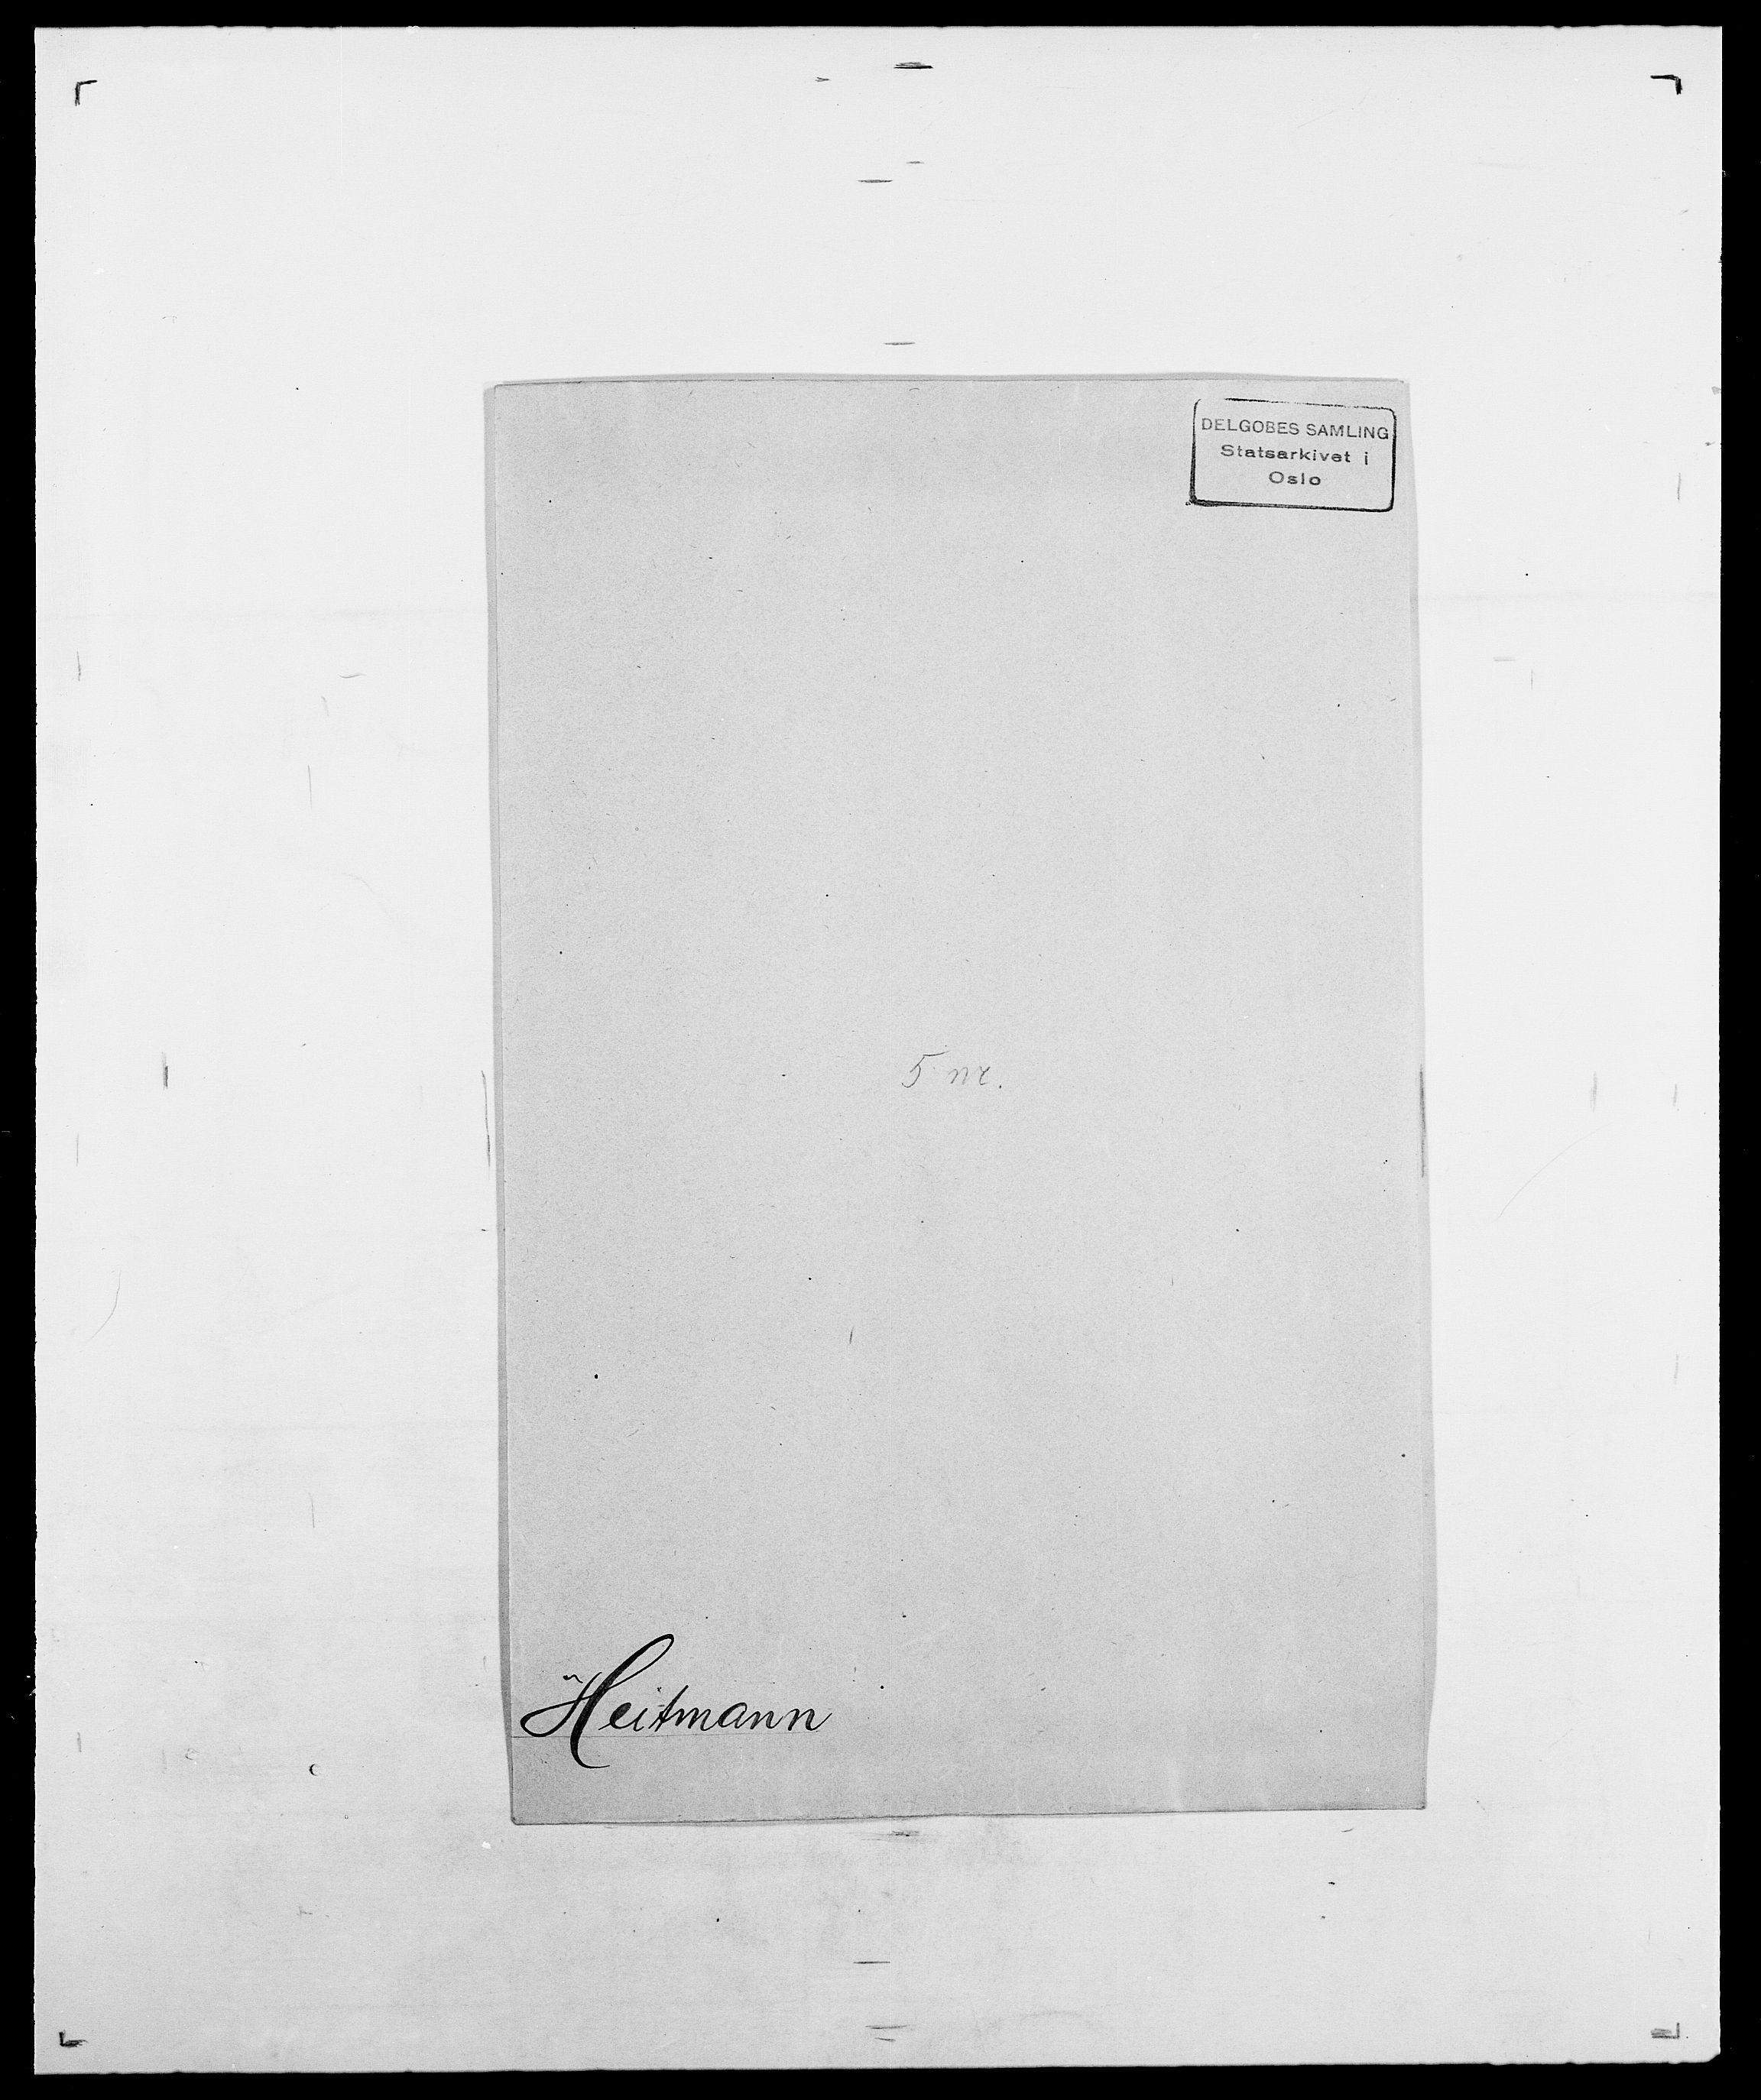 SAO, Delgobe, Charles Antoine - samling, D/Da/L0016: Hamborg - Hektoen, s. 867